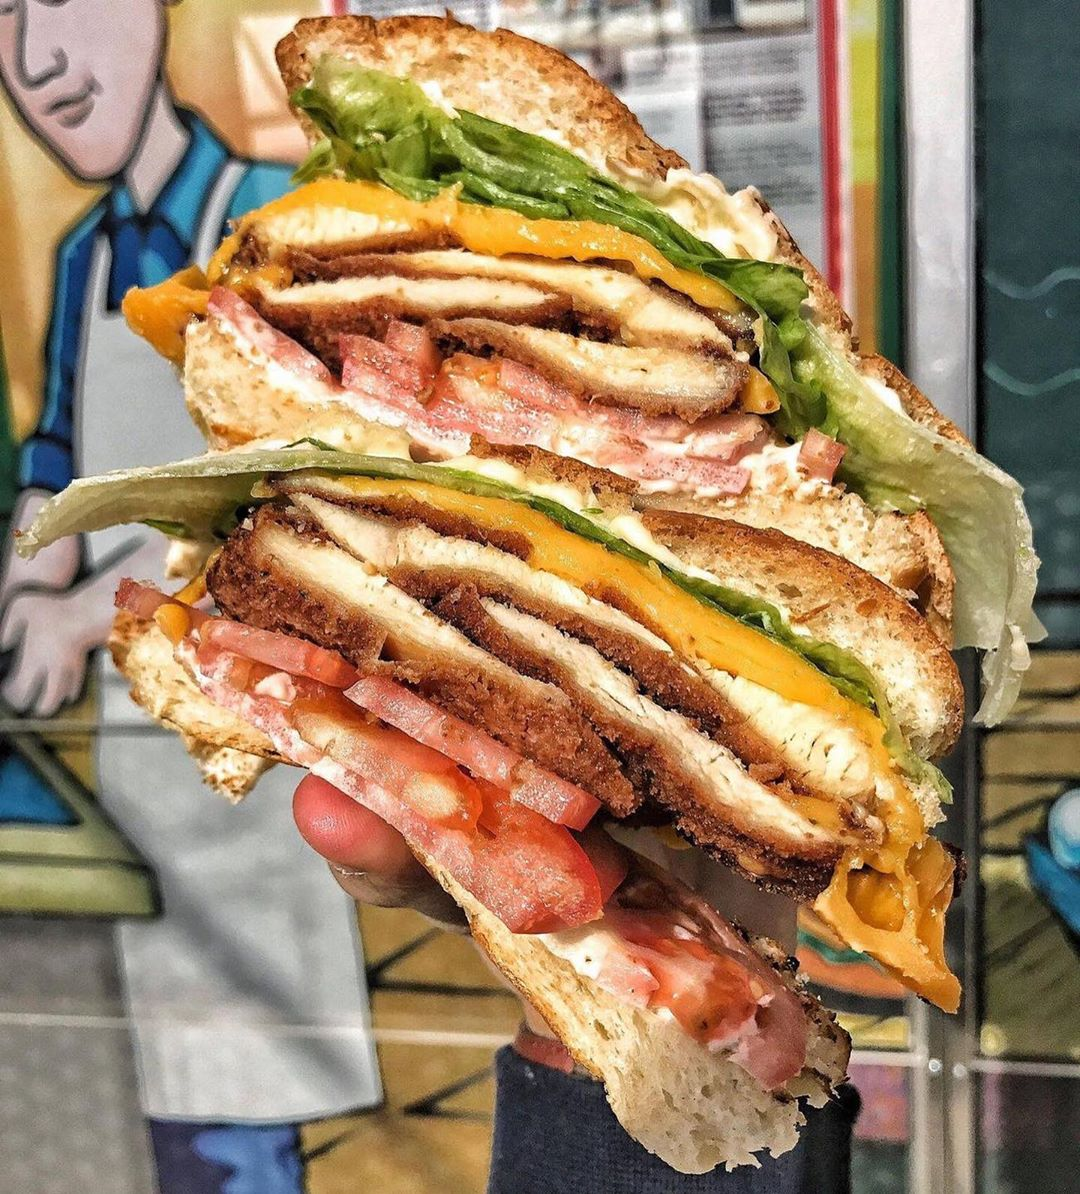 That's a good looking sandwich | 🔁: @thebagelmaster/IG https://t.co/ZwVtDVYrvH